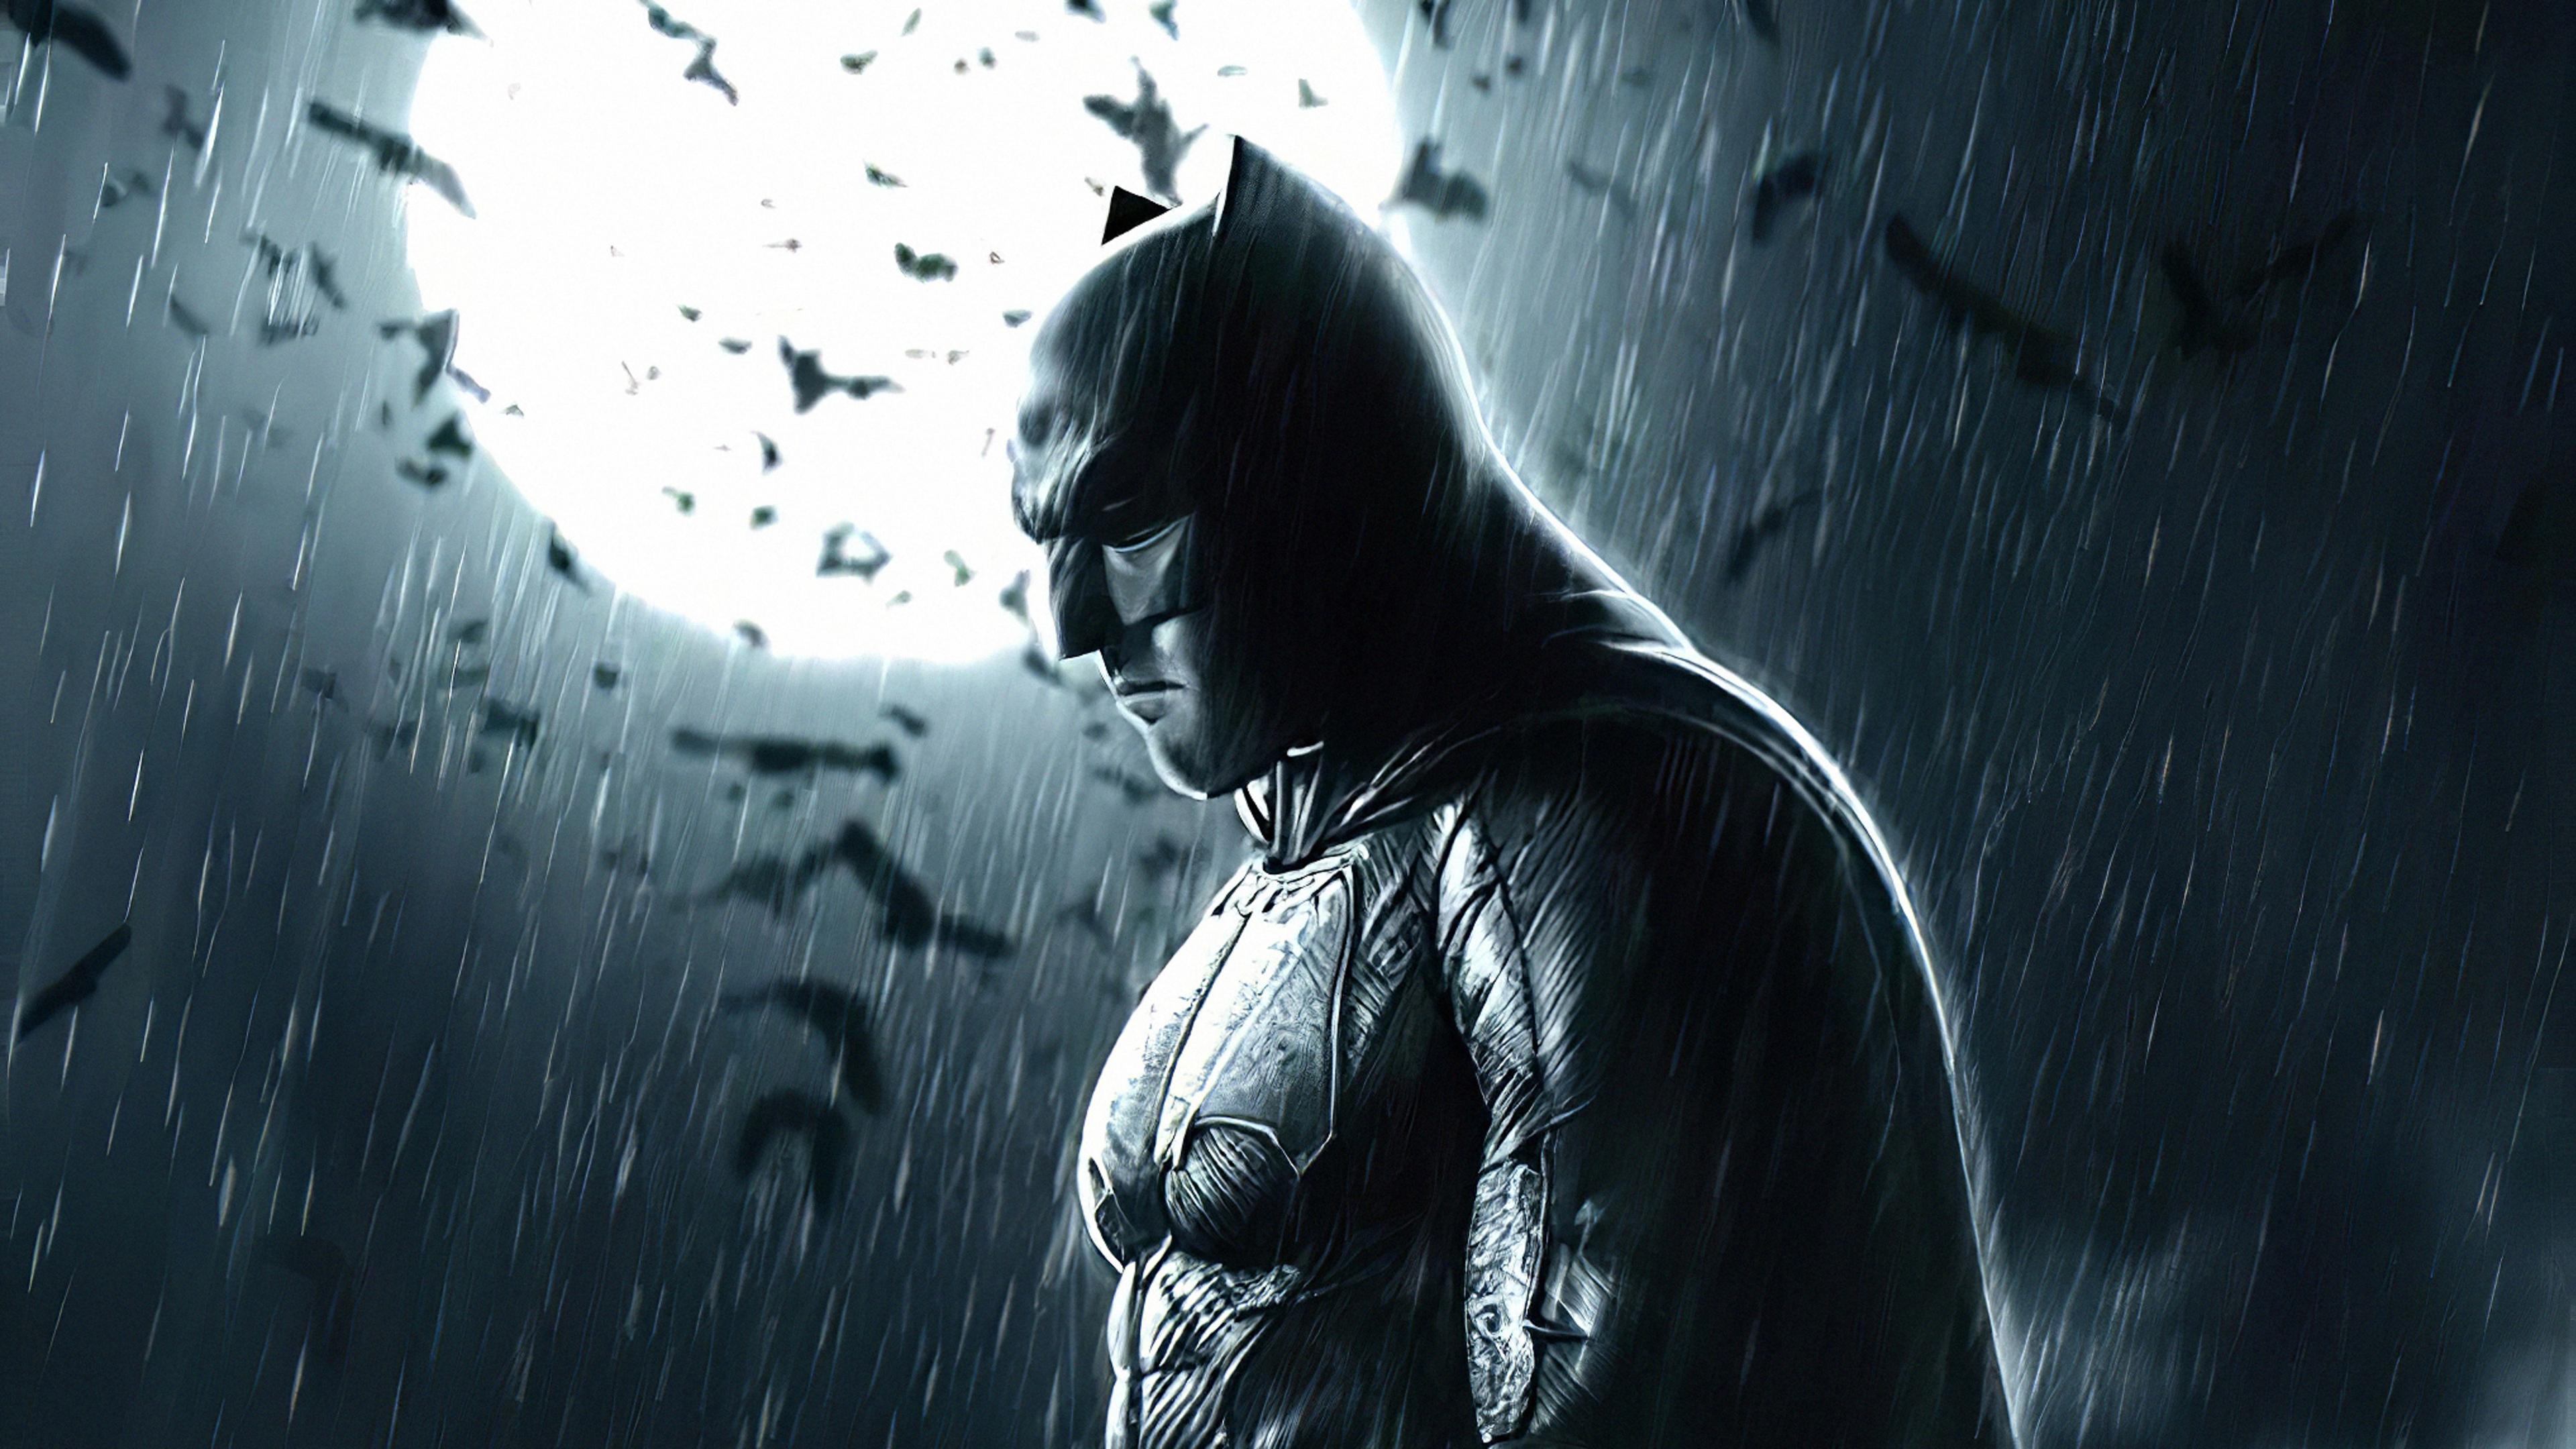 3840x2160 Batman Knightartwork 4k HD 4k Wallpapers, Images ...